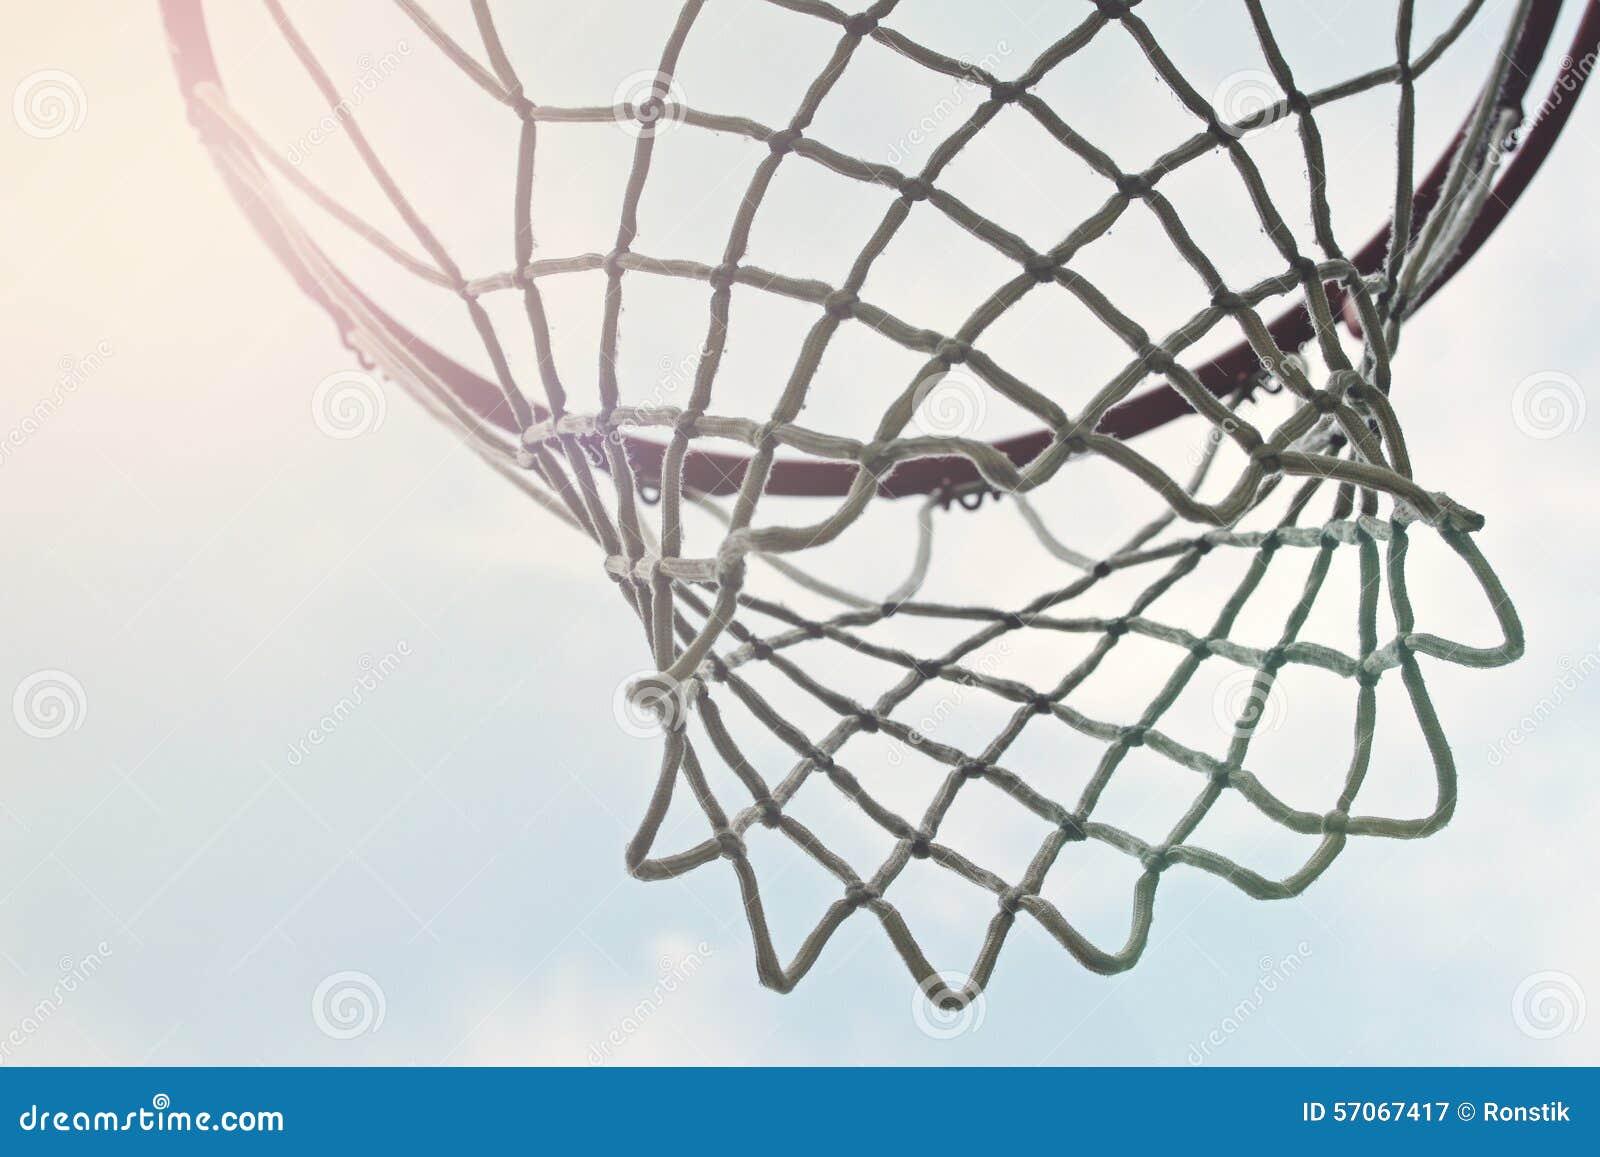 Close-up van openlucht netto basketbalhoepel